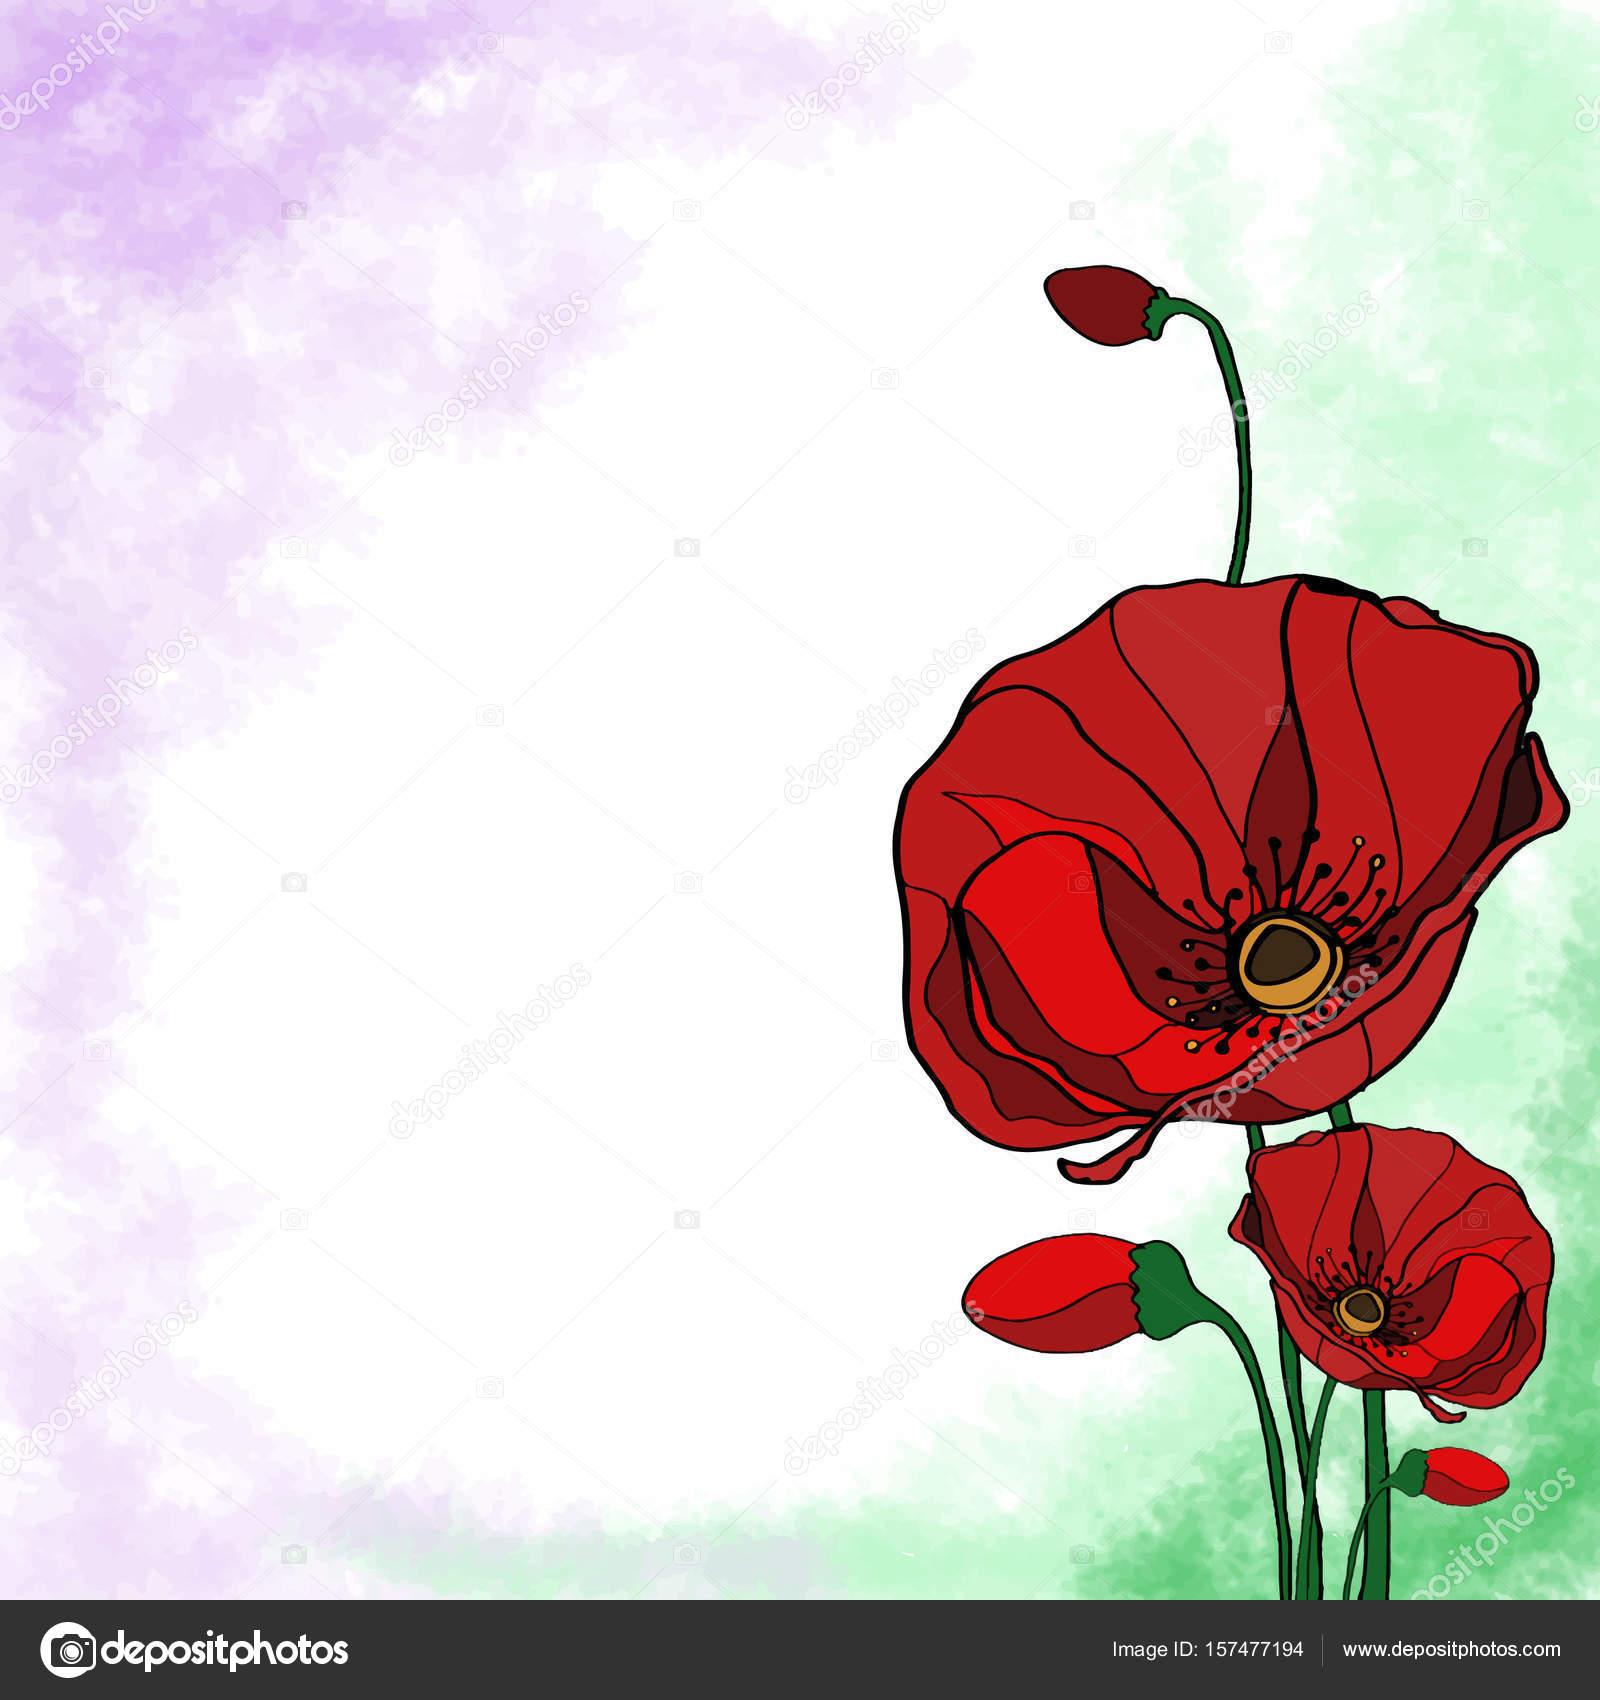 Marco de flor amapola flores — Foto de stock © designartks #157477194